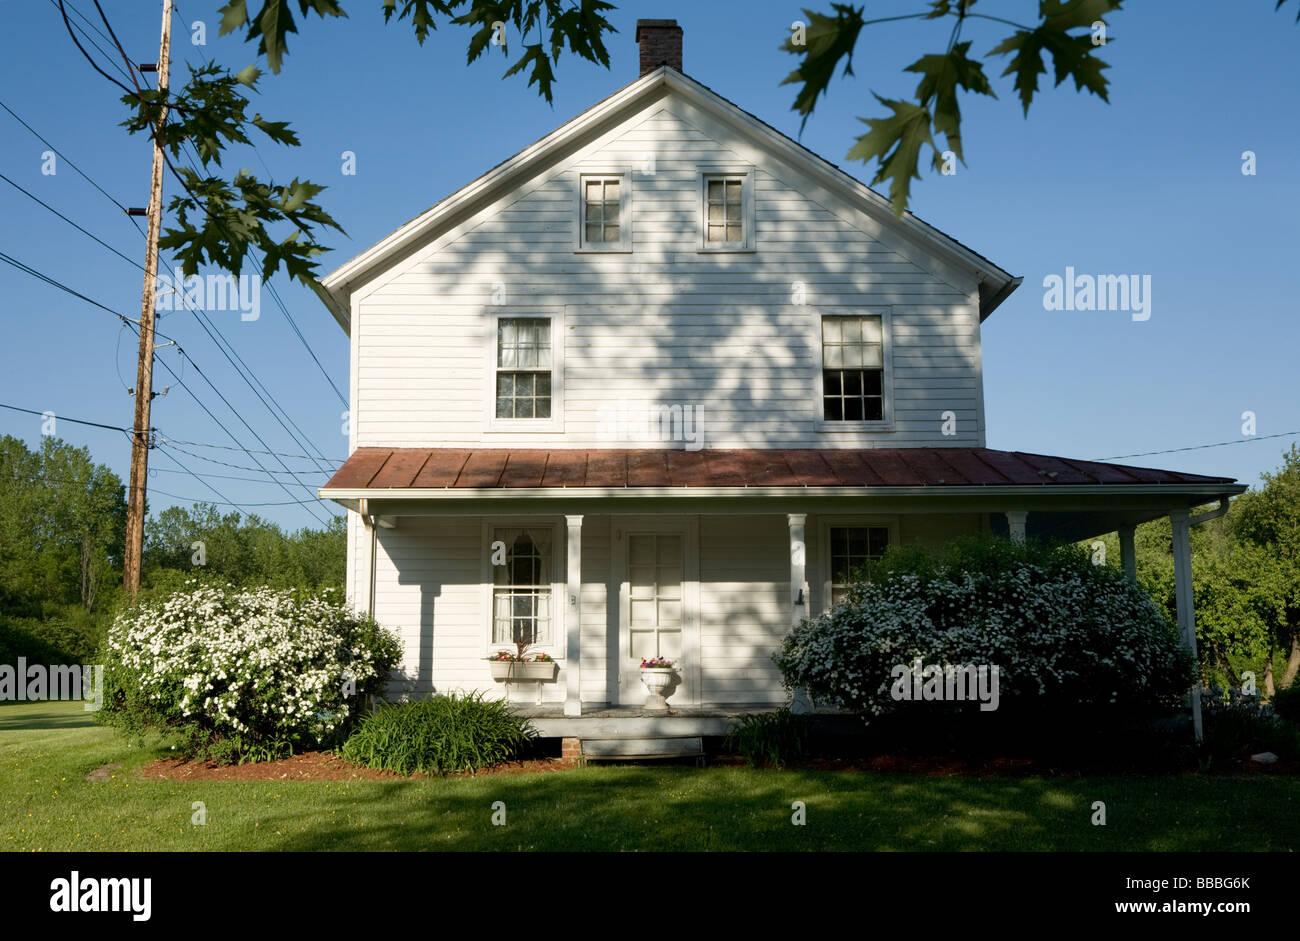 New york cayuga county - Harriet Tubman Home Auburn New York Cayuga County Finger Lakes